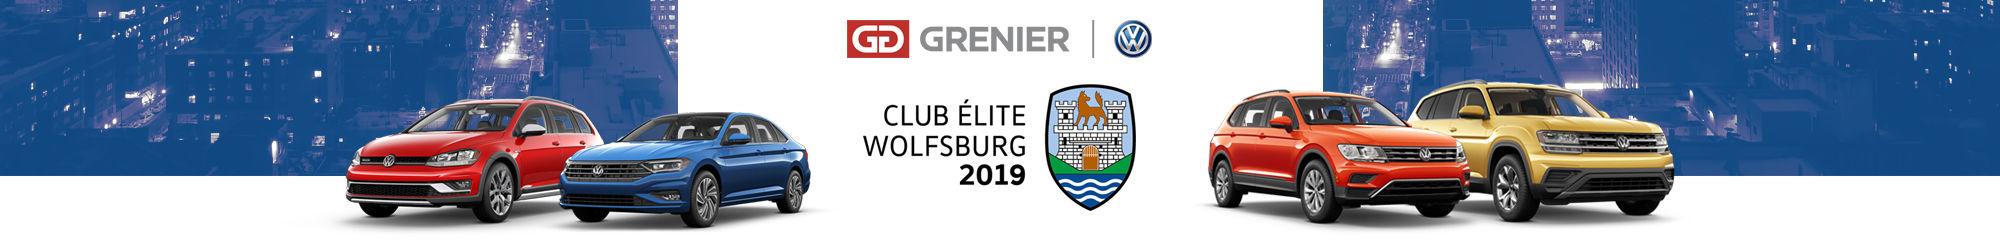 Membre Club Wolfsburg 2019